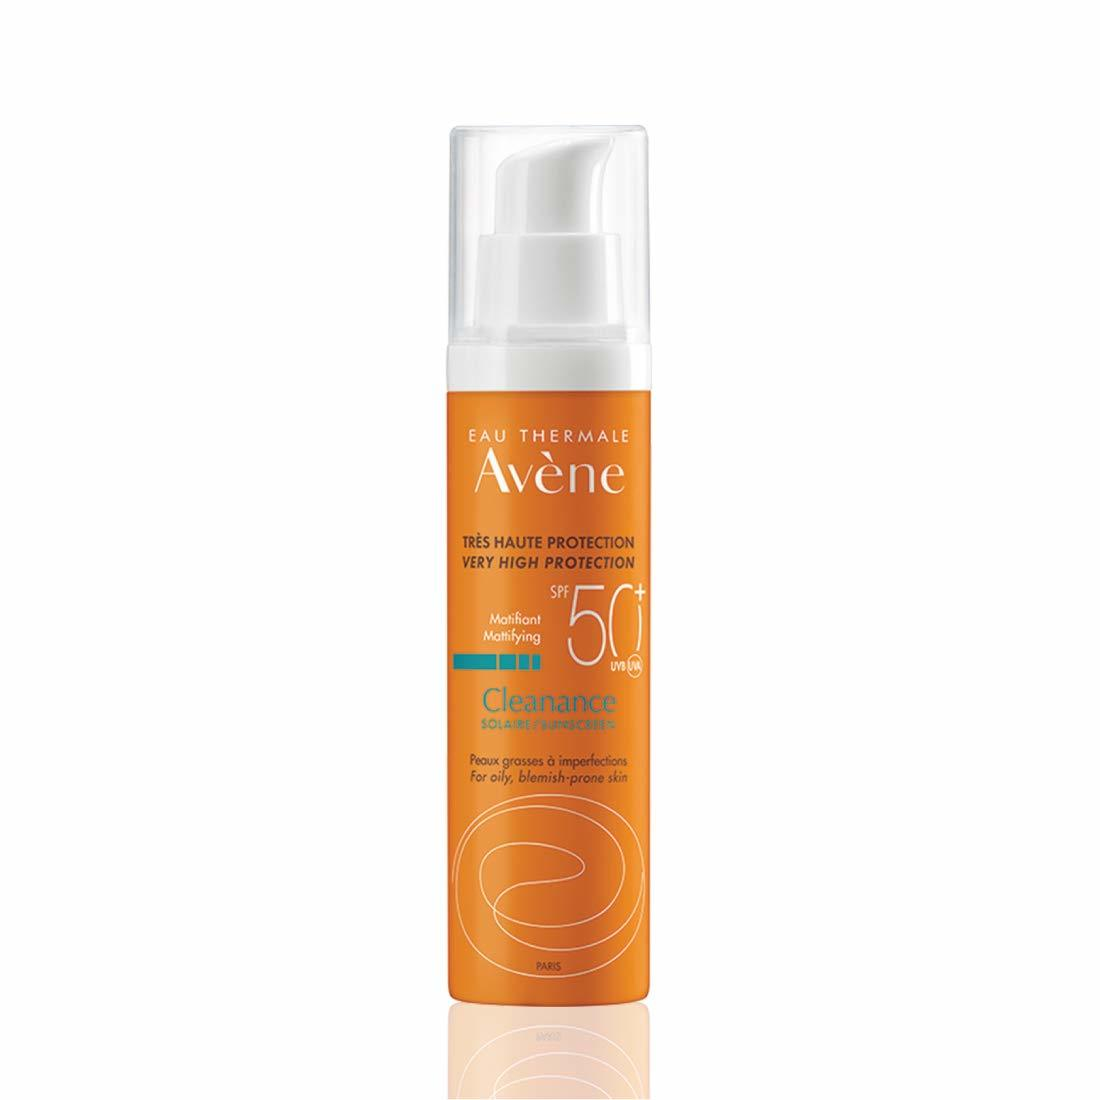 Avene Very High Protection SPF 50 Cleanance